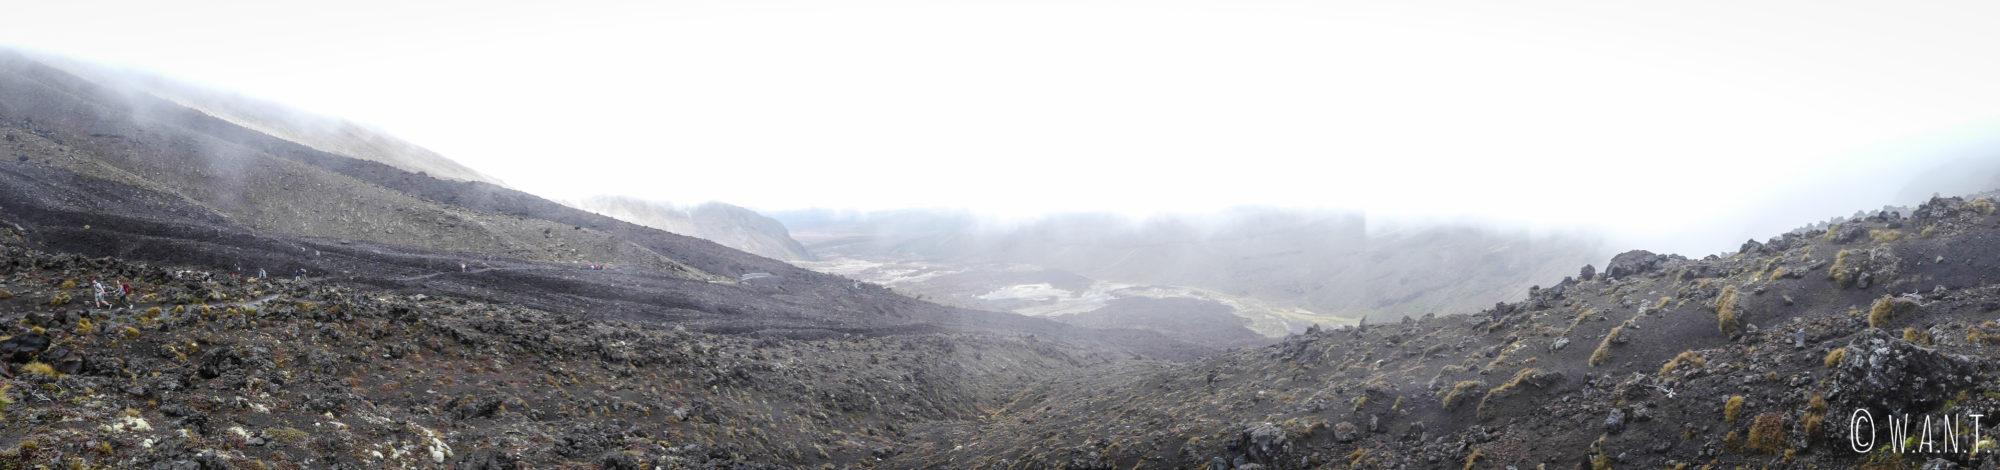 Panorama sur la randonnée « Tongariro Alpine Crossing » en Nouvelle-Zélande